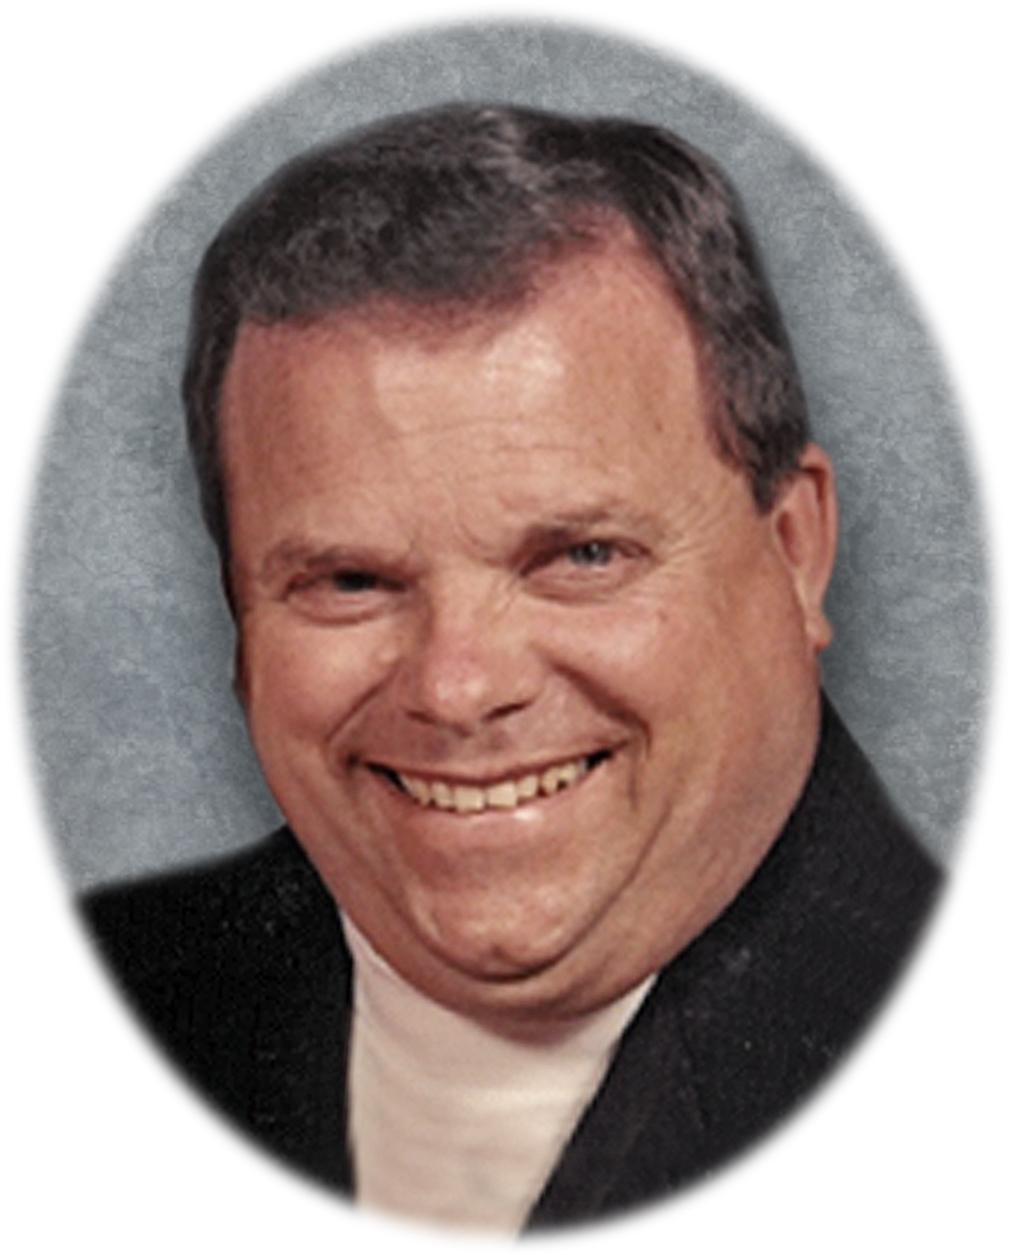 Stephen P. Piechota